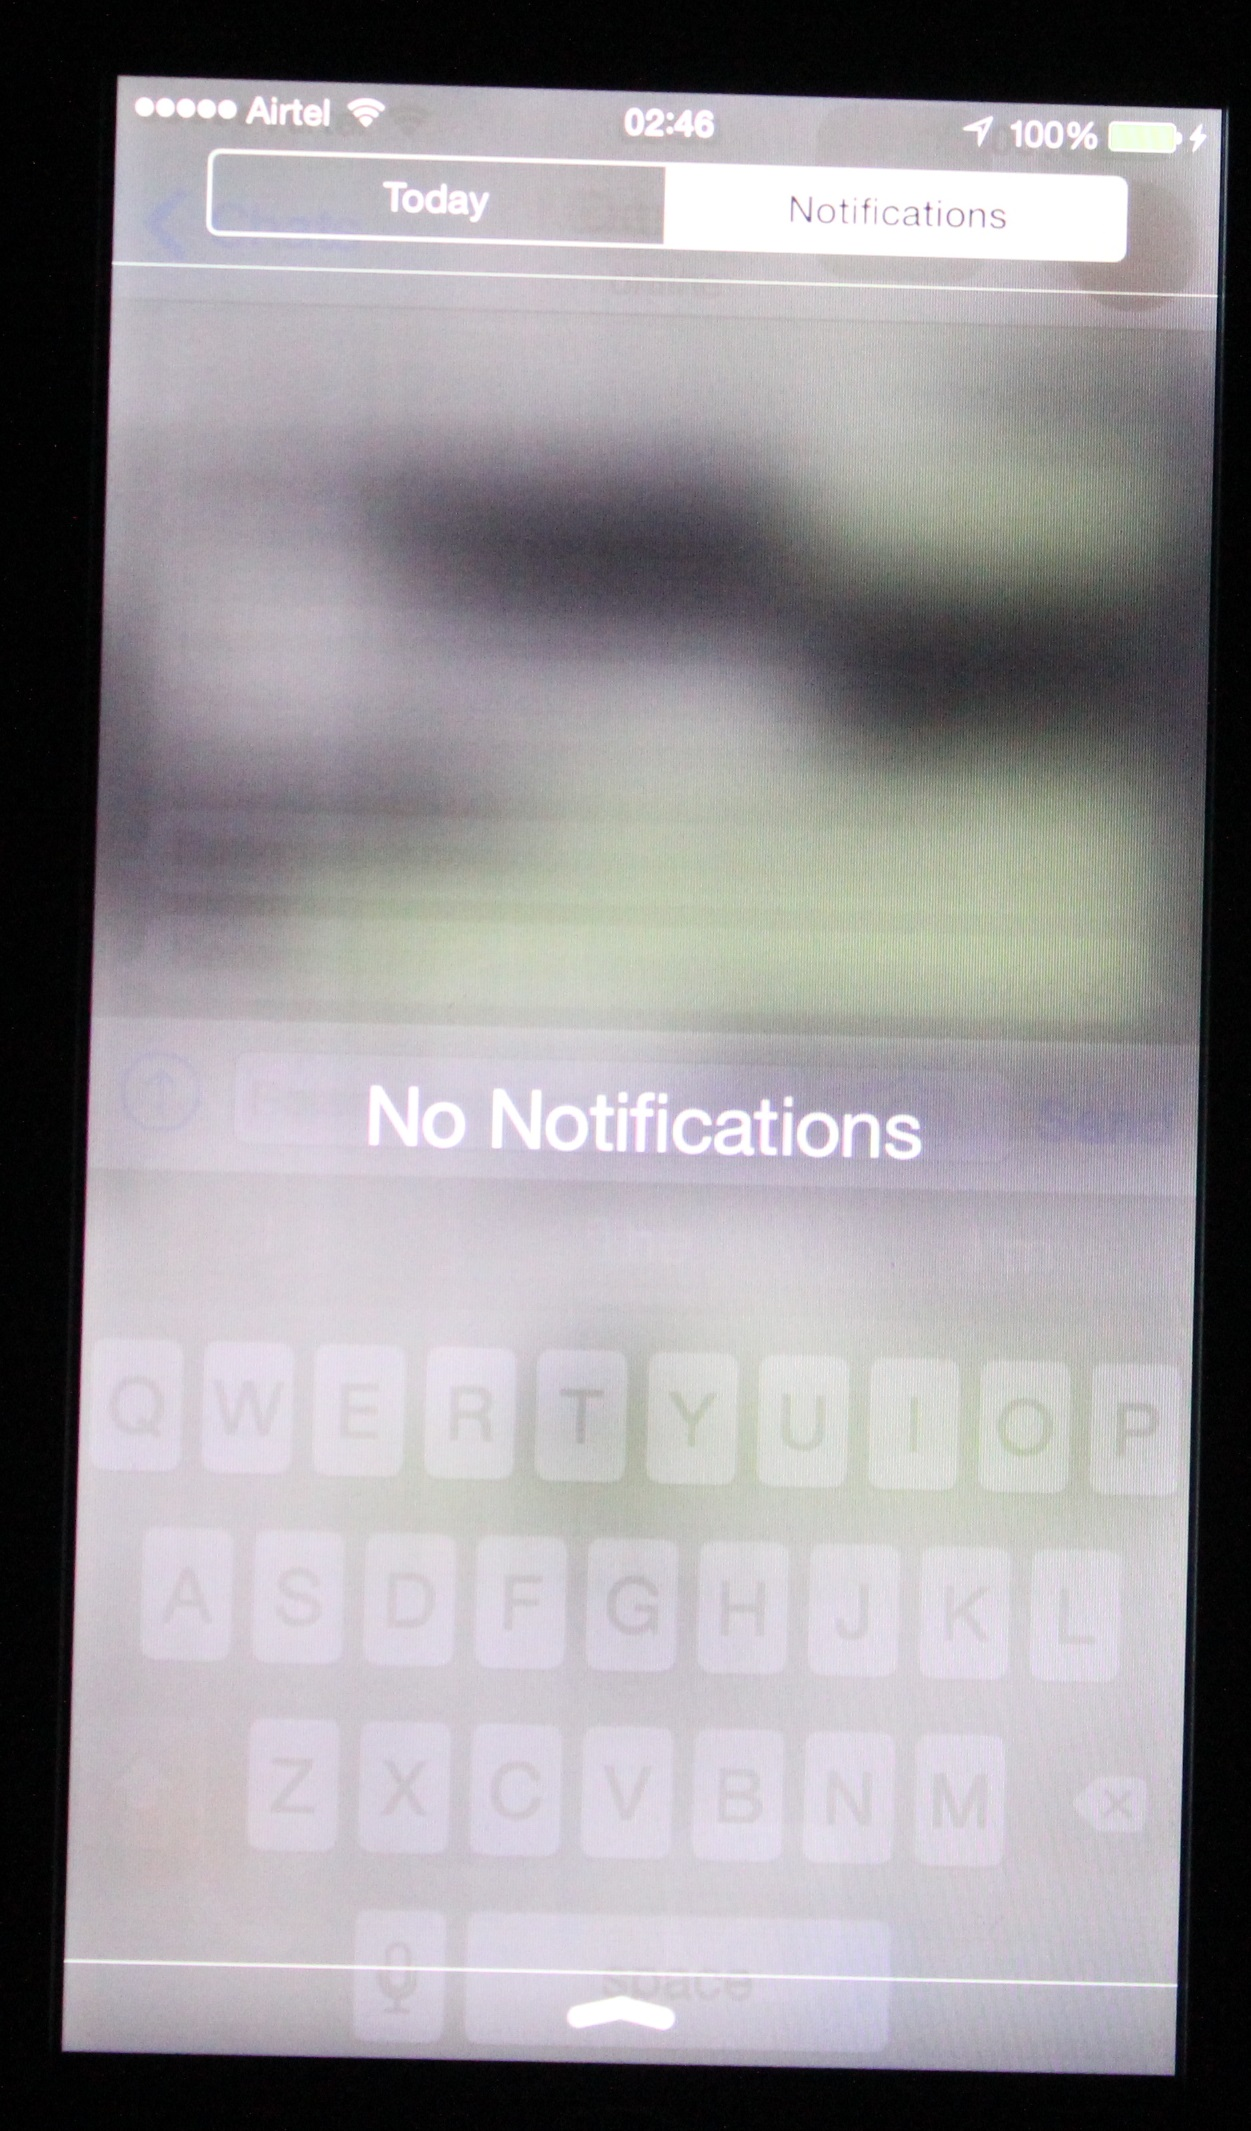 How To Fix Screen Burn Iphone 6 ••▷ SFB